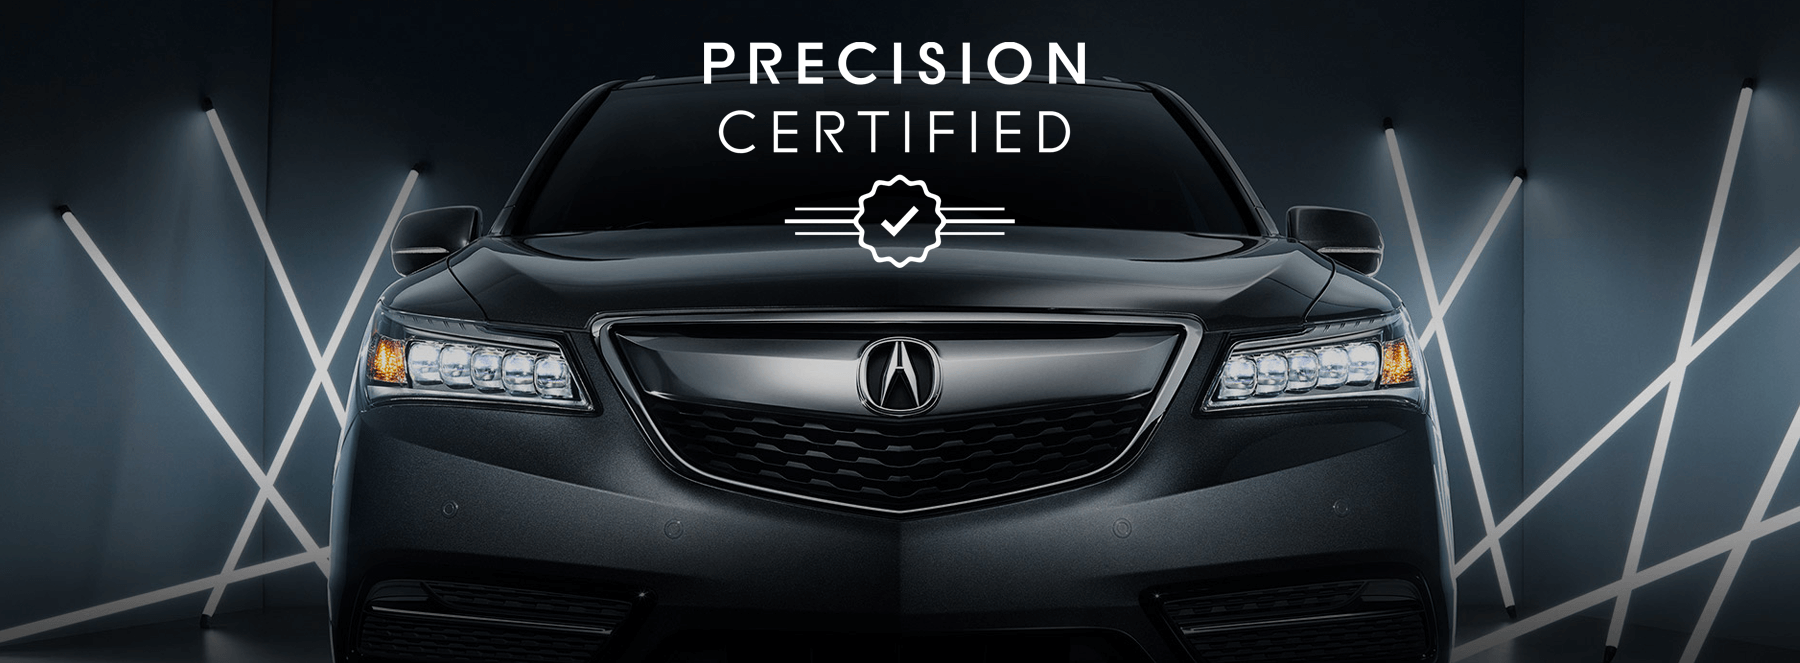 Acura Precision Certified Slider